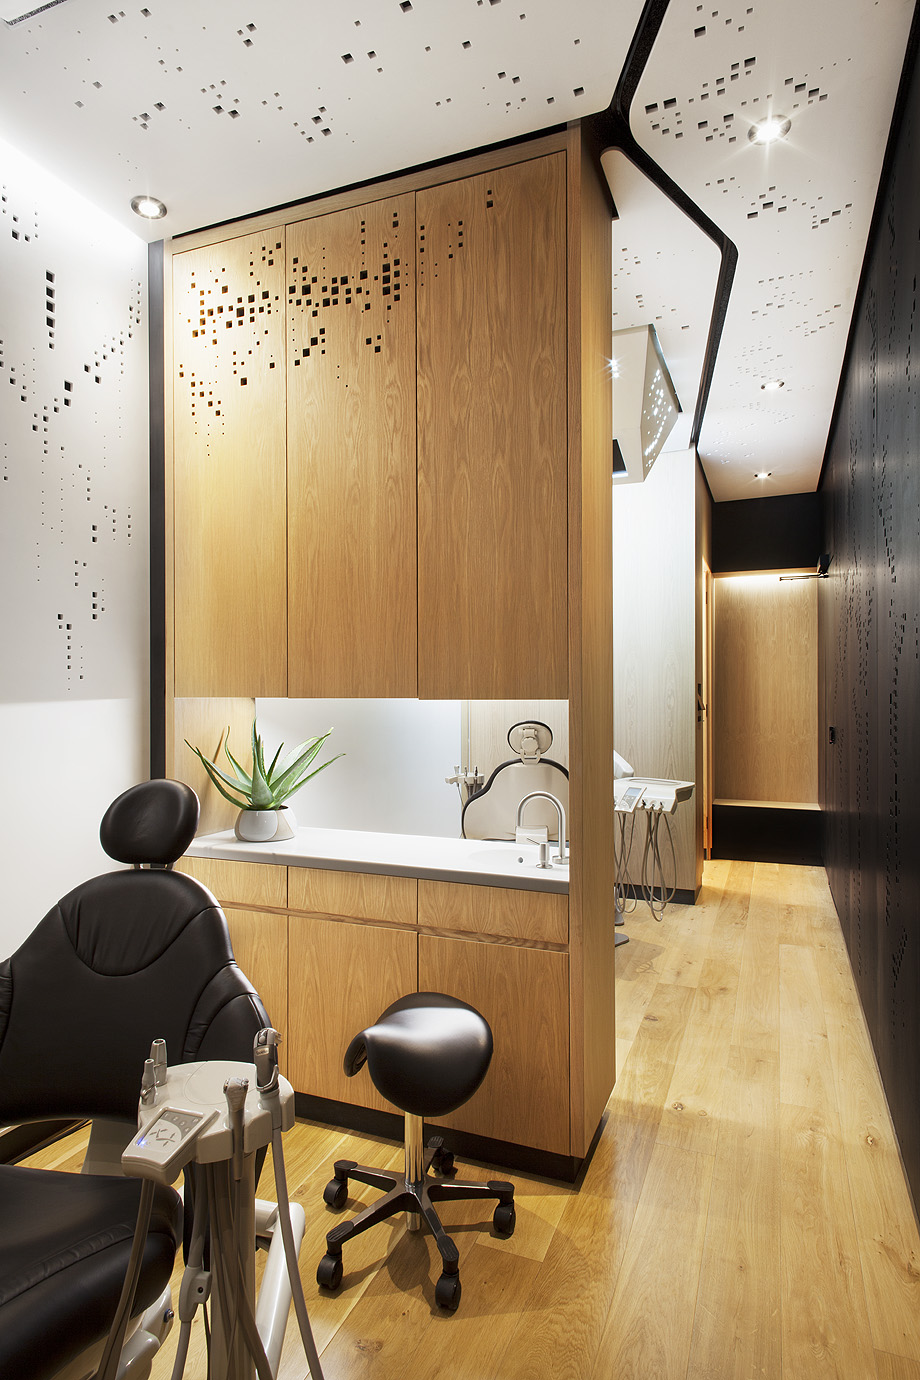 studio dental mdu de montalba architects - foto mitch tobias (3)